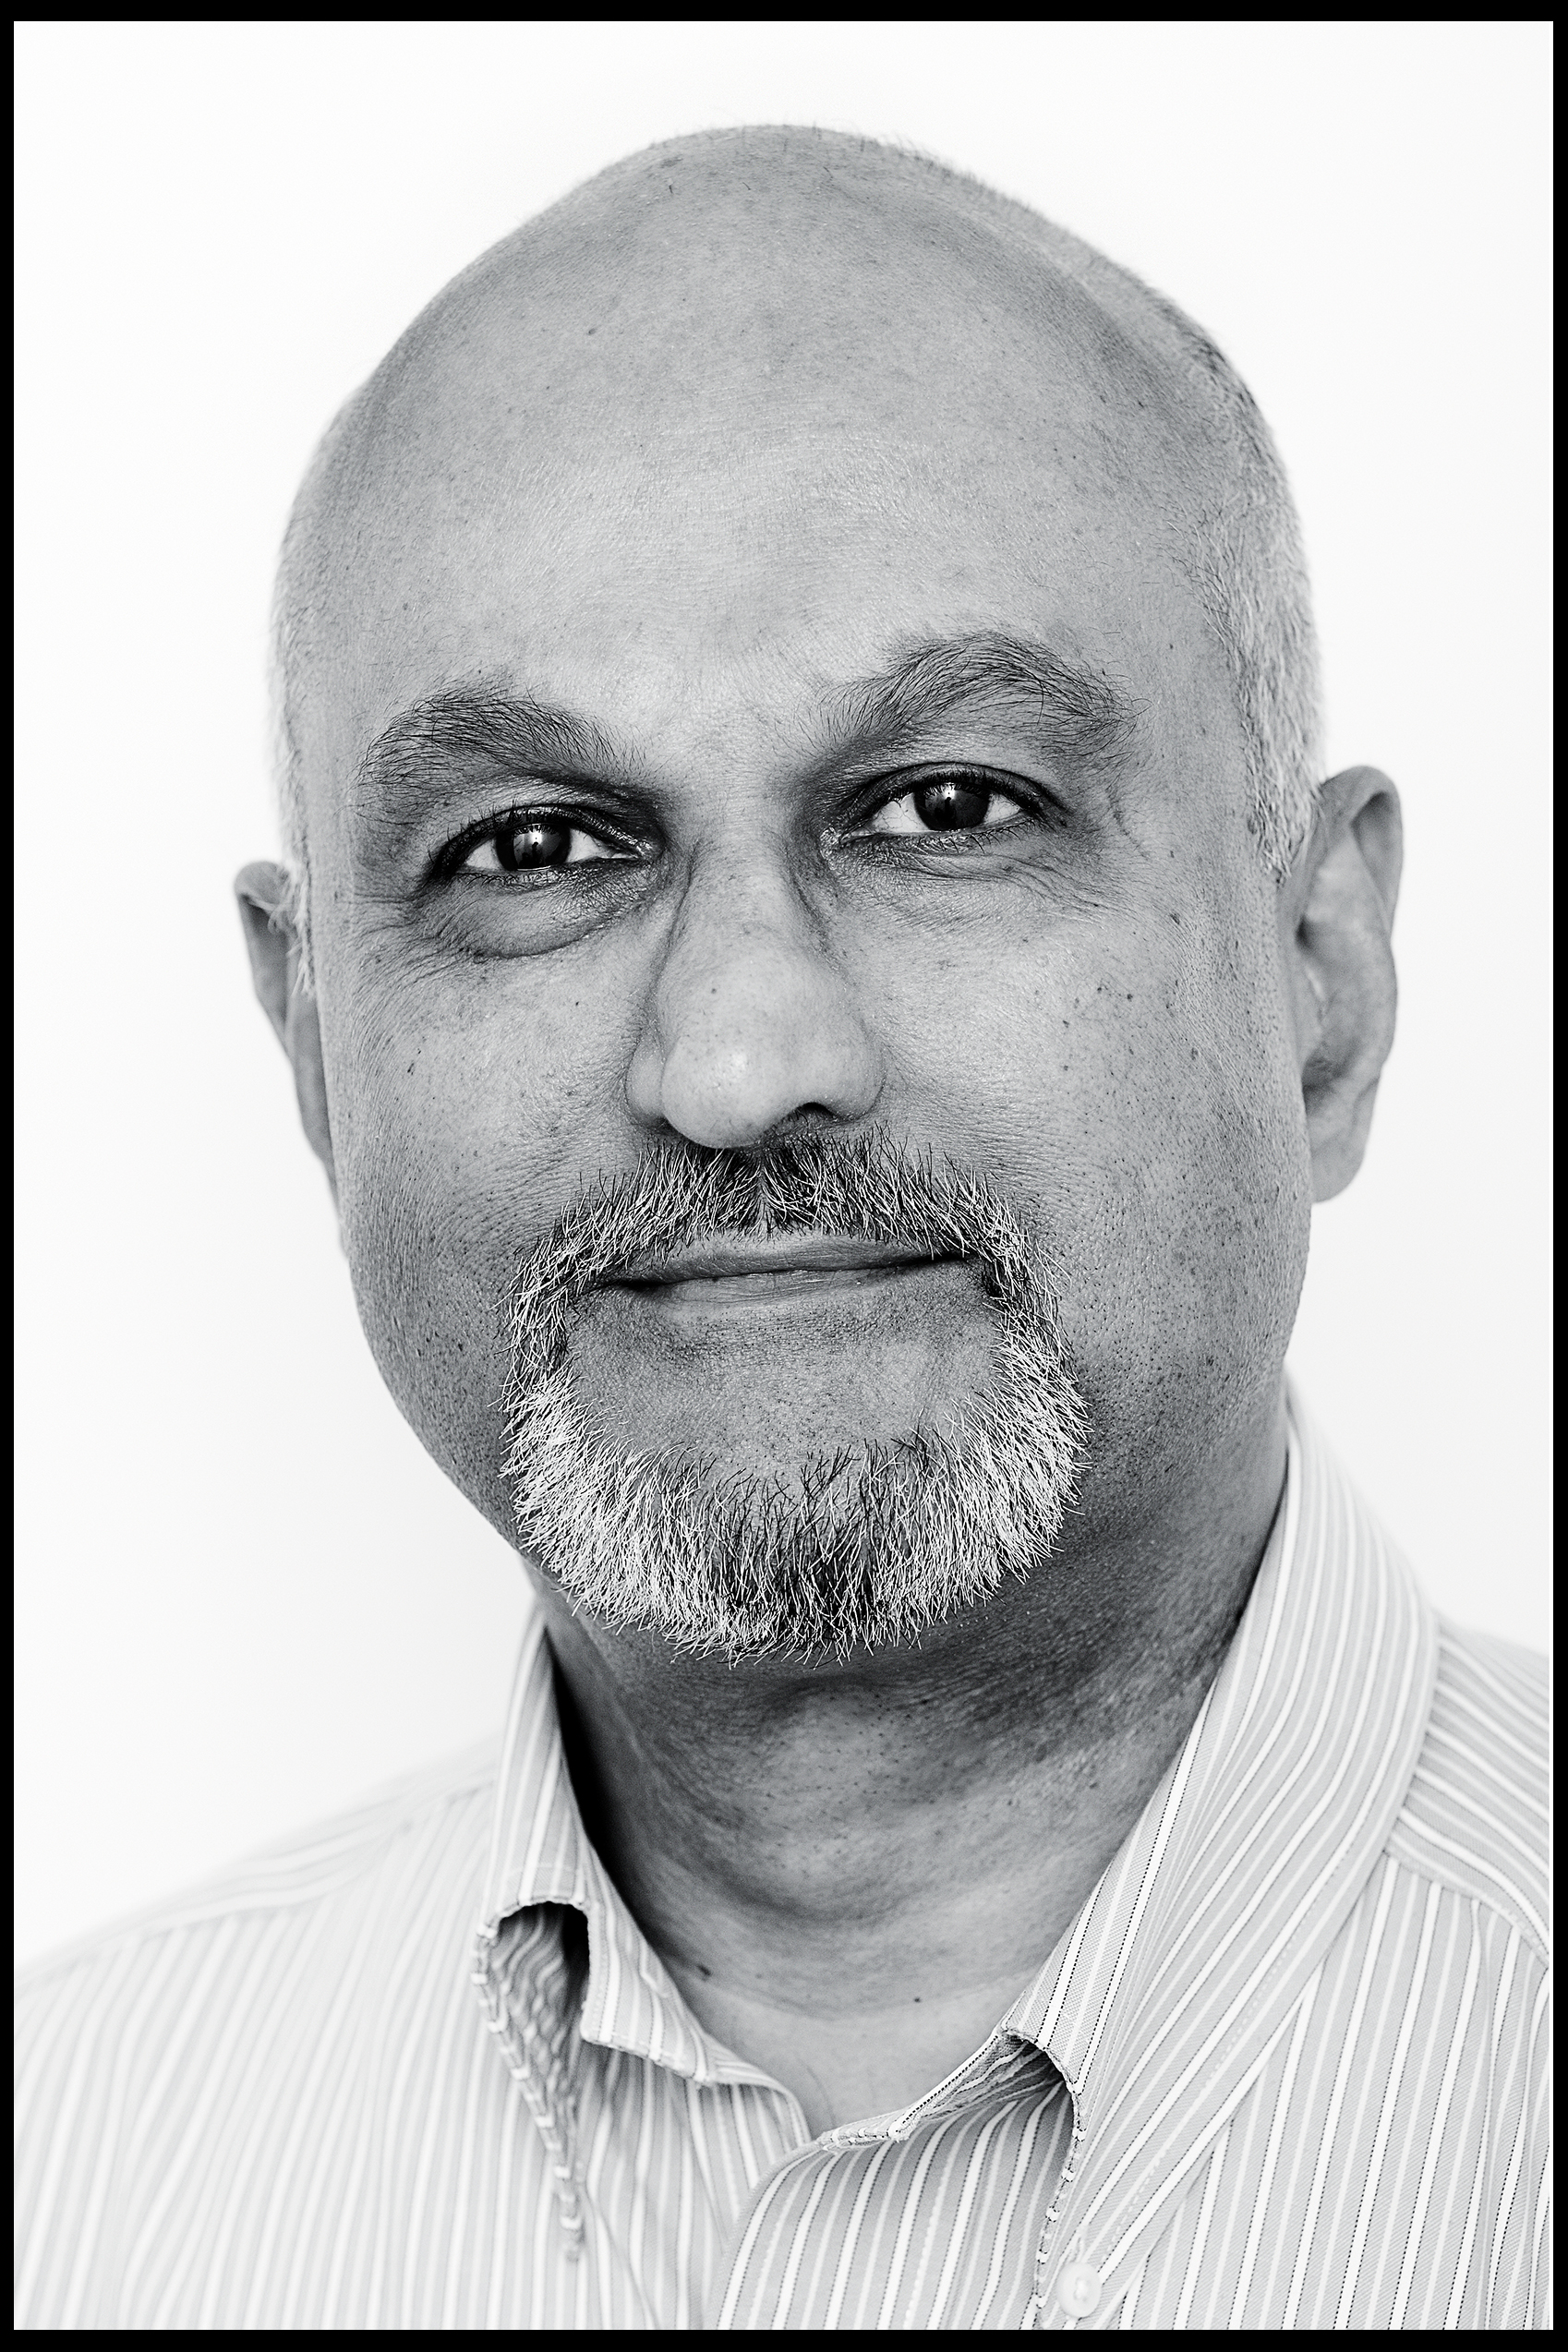 corporate headshot of a man with a beard